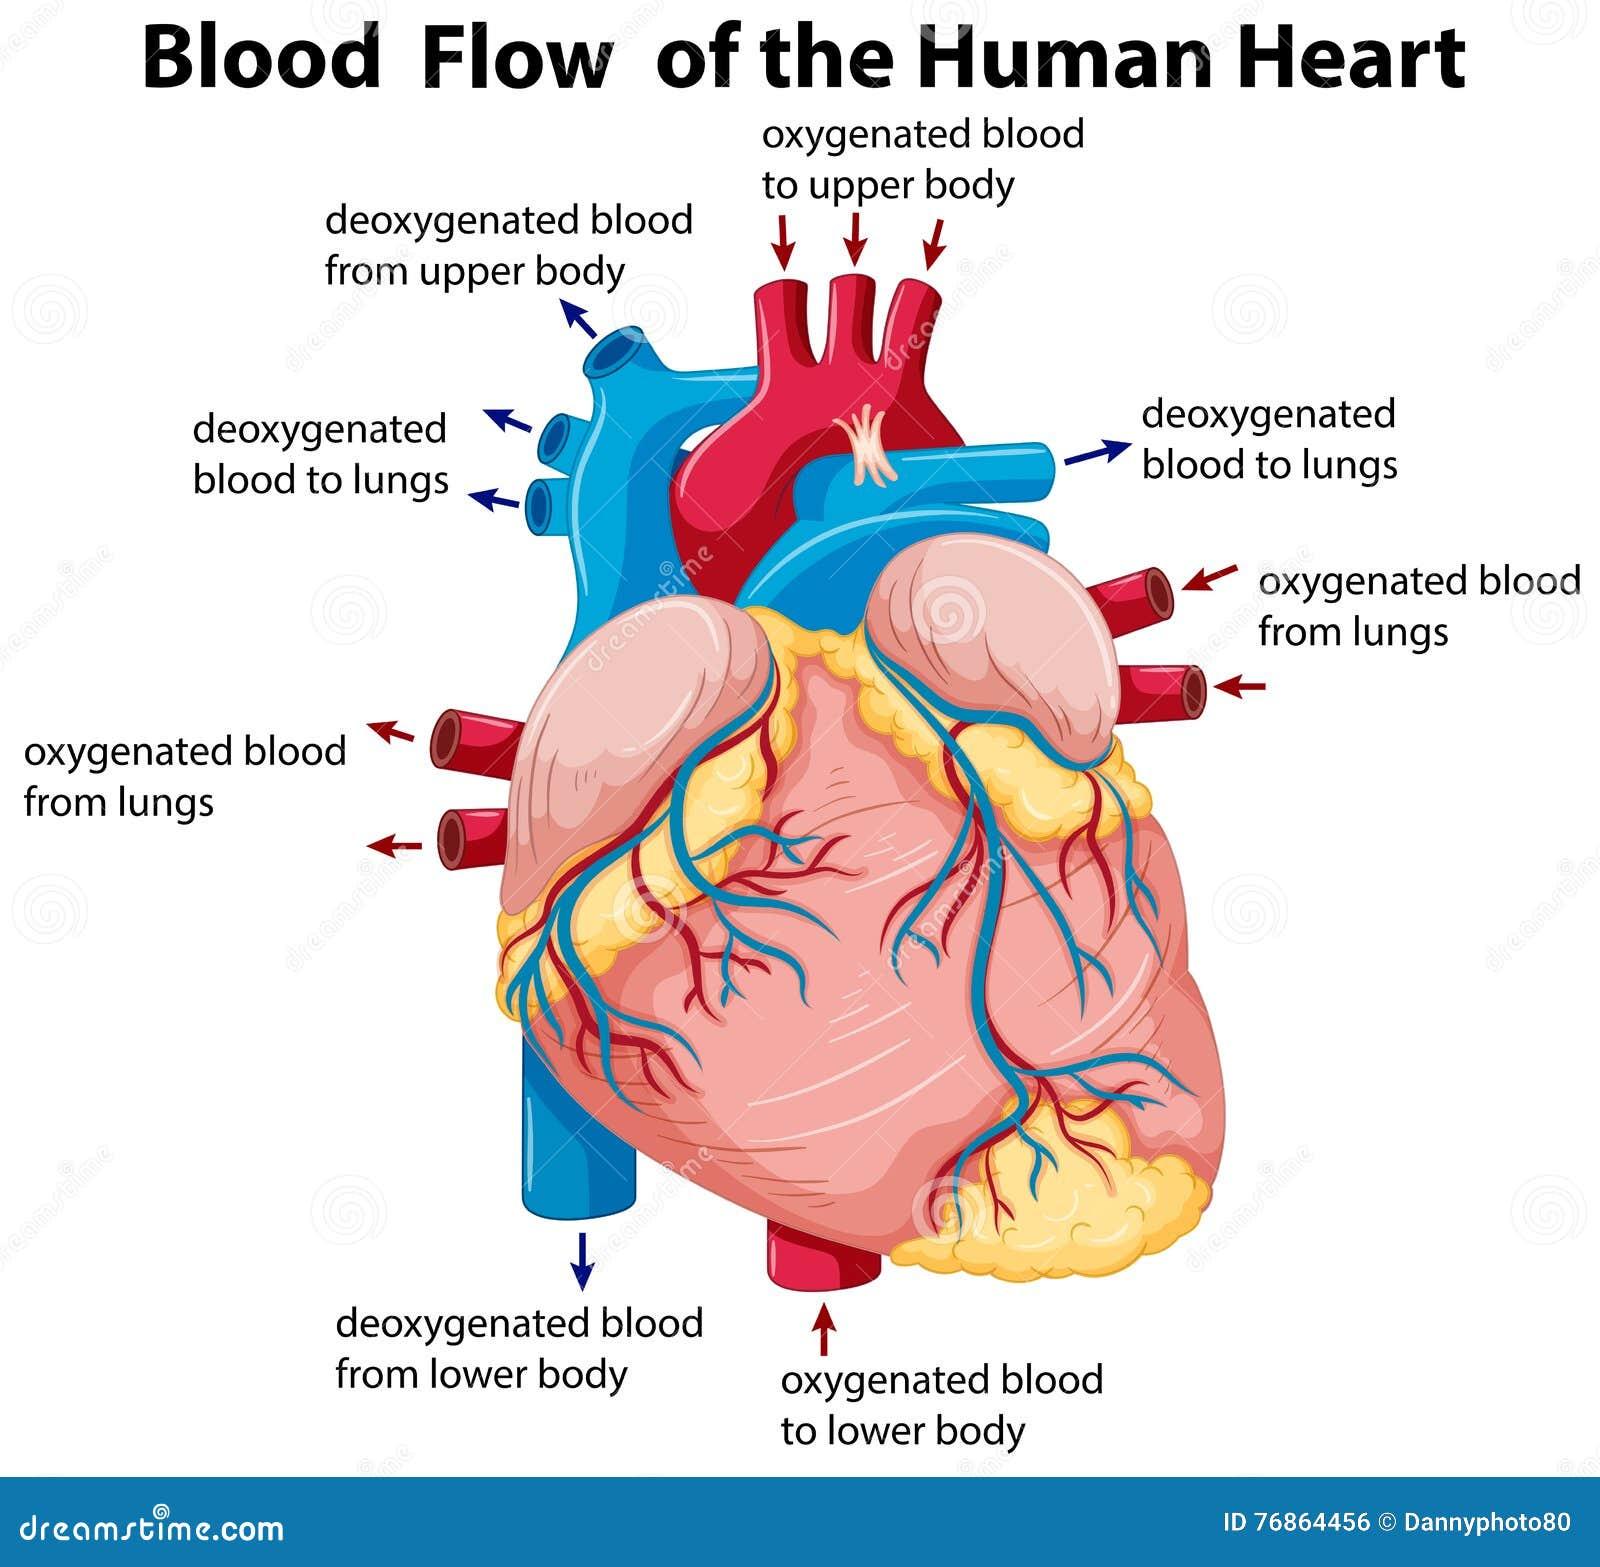 Diagram showing blood flow in human heart